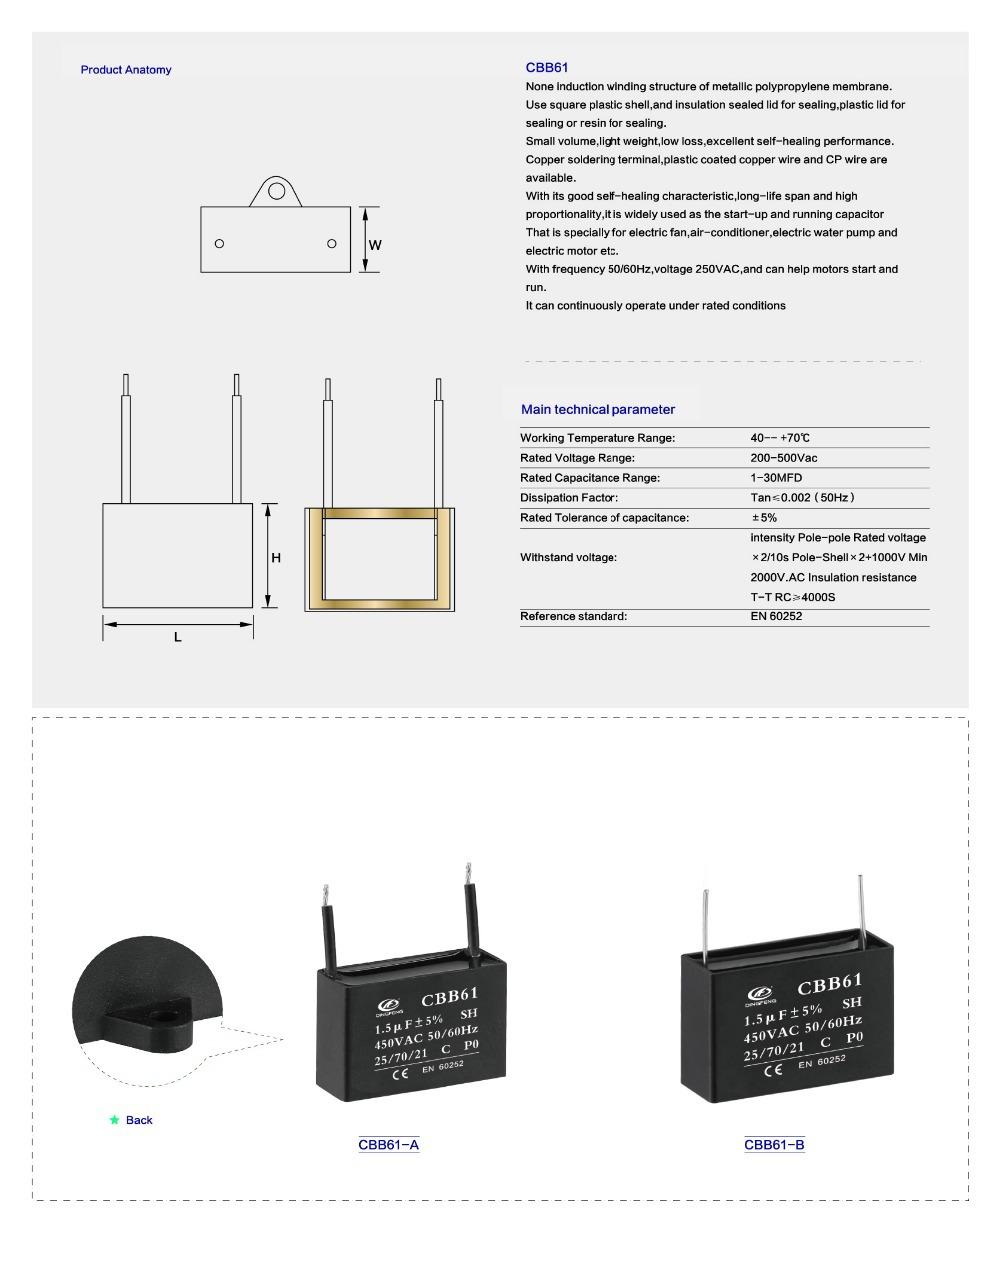 bm cbb61 wiring diagram